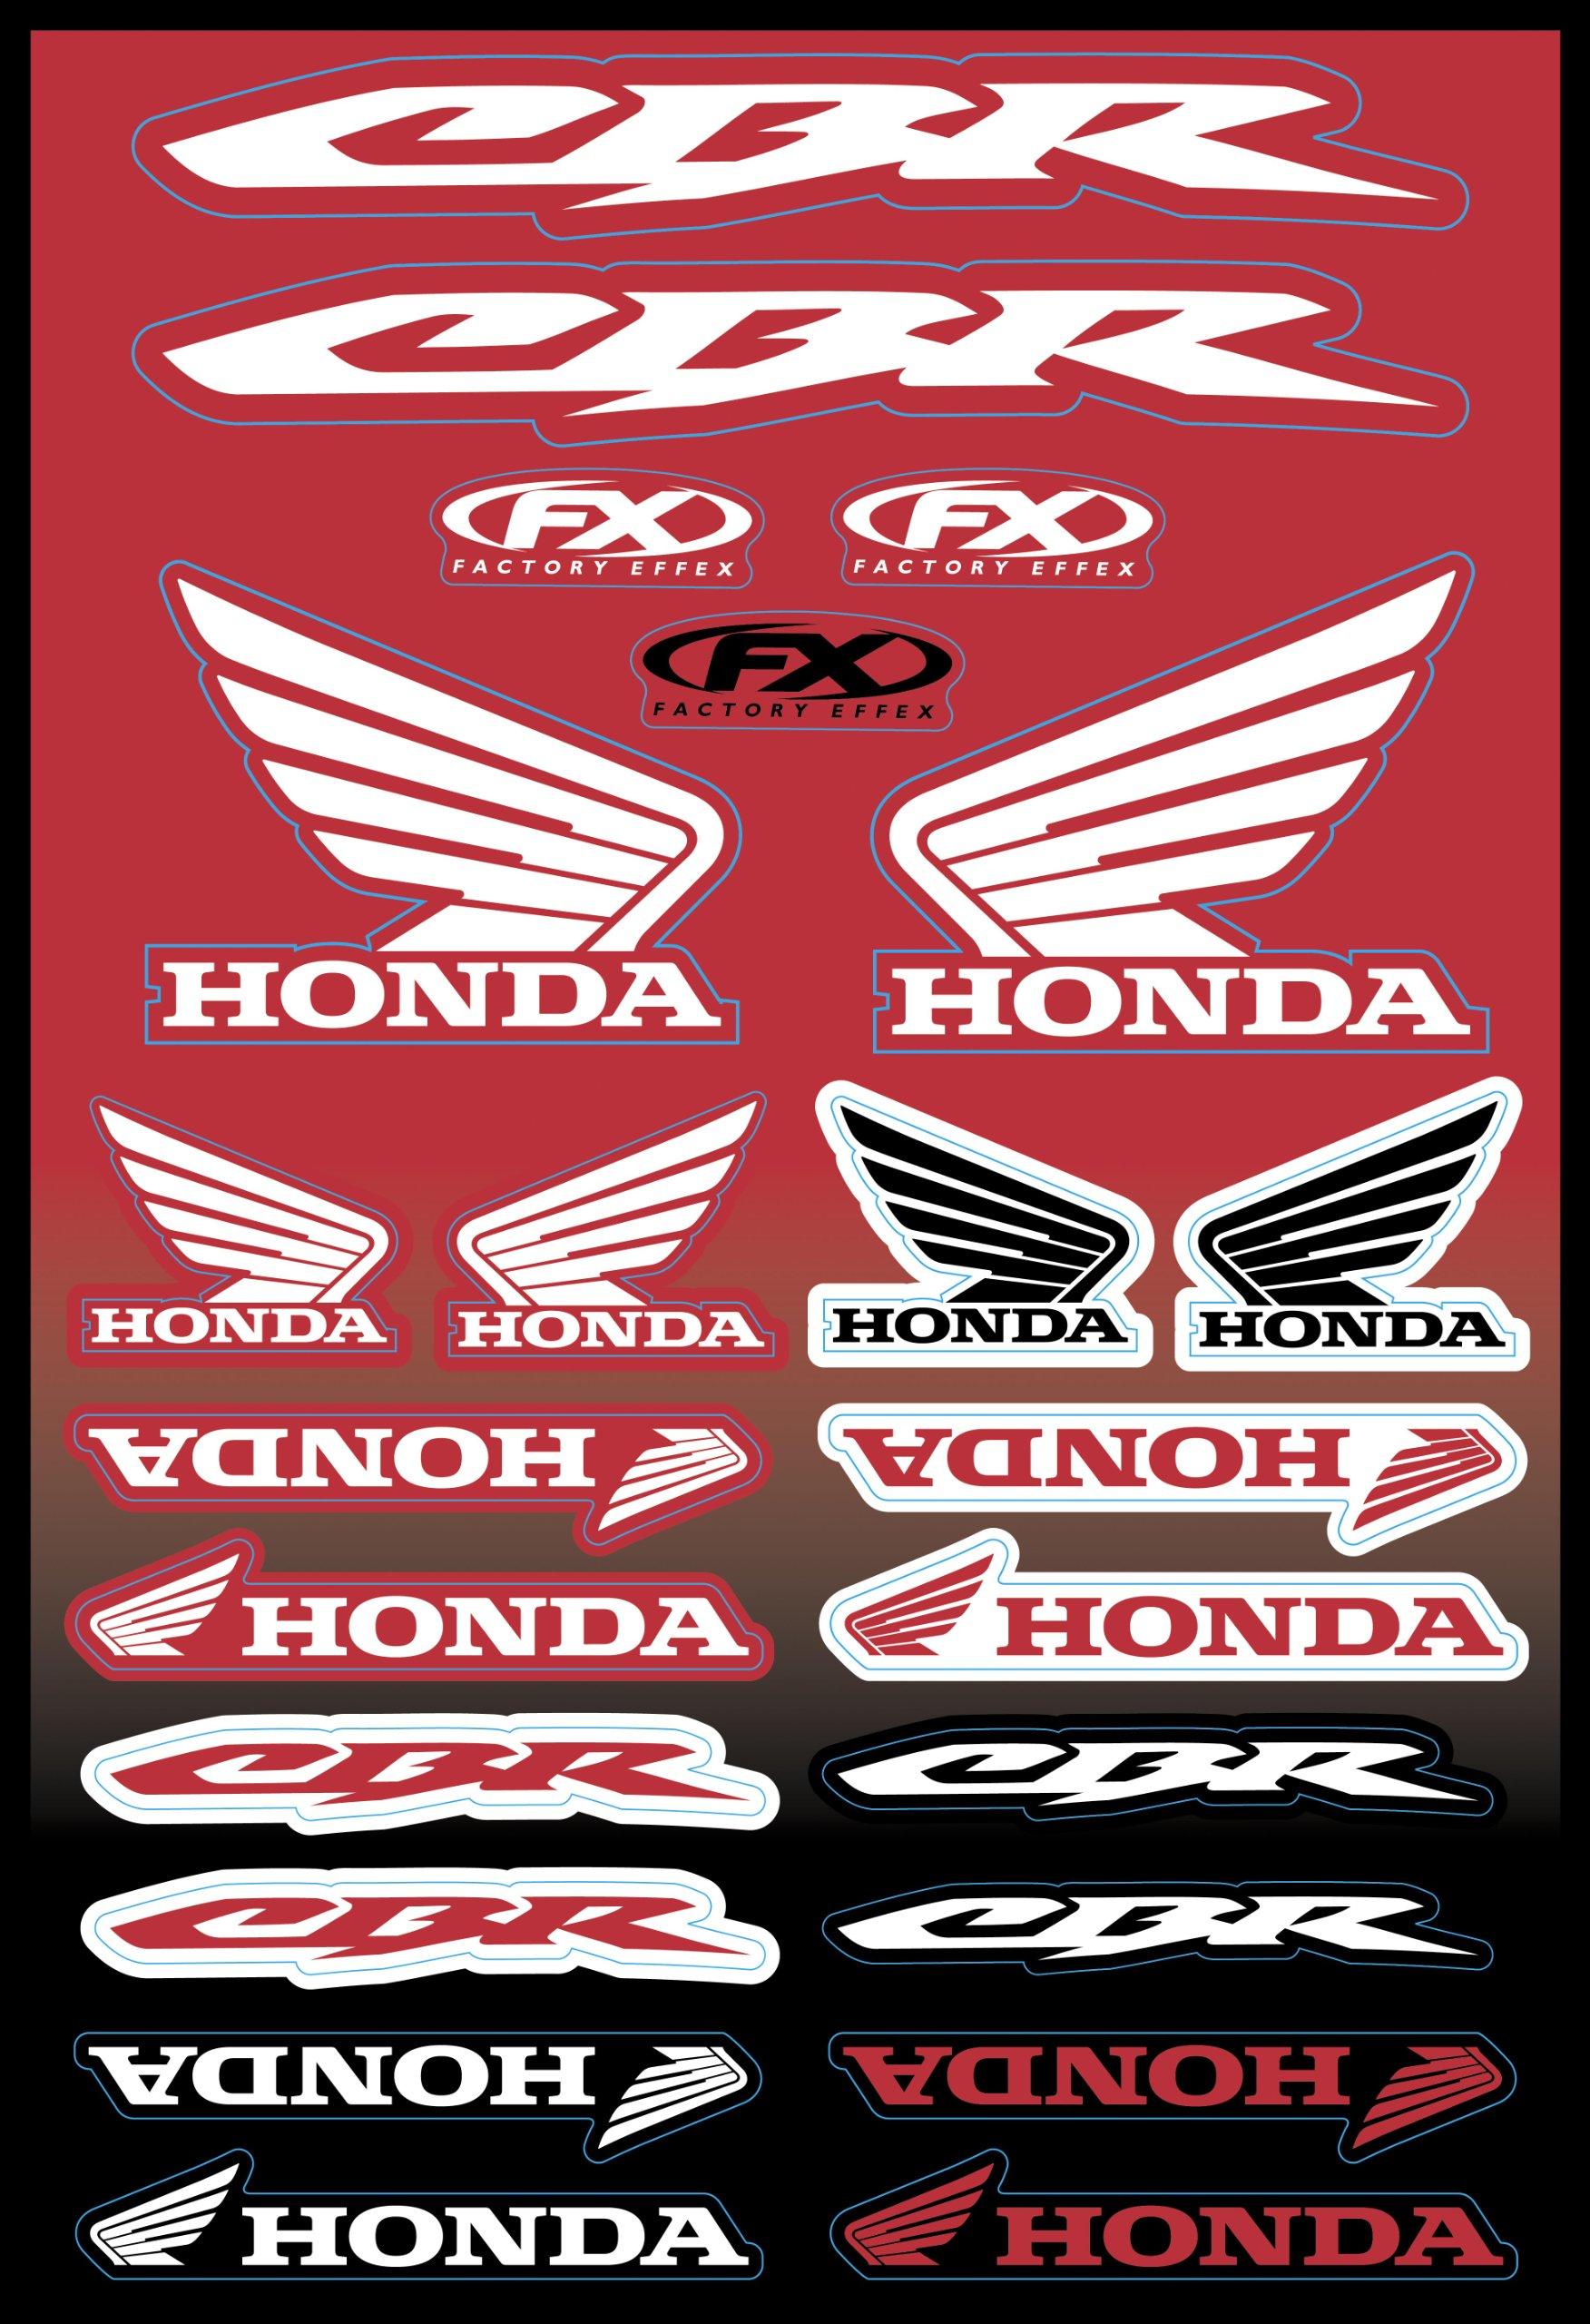 Factory Effex 15-68300 OEM Universal Graphic Kit for Honda